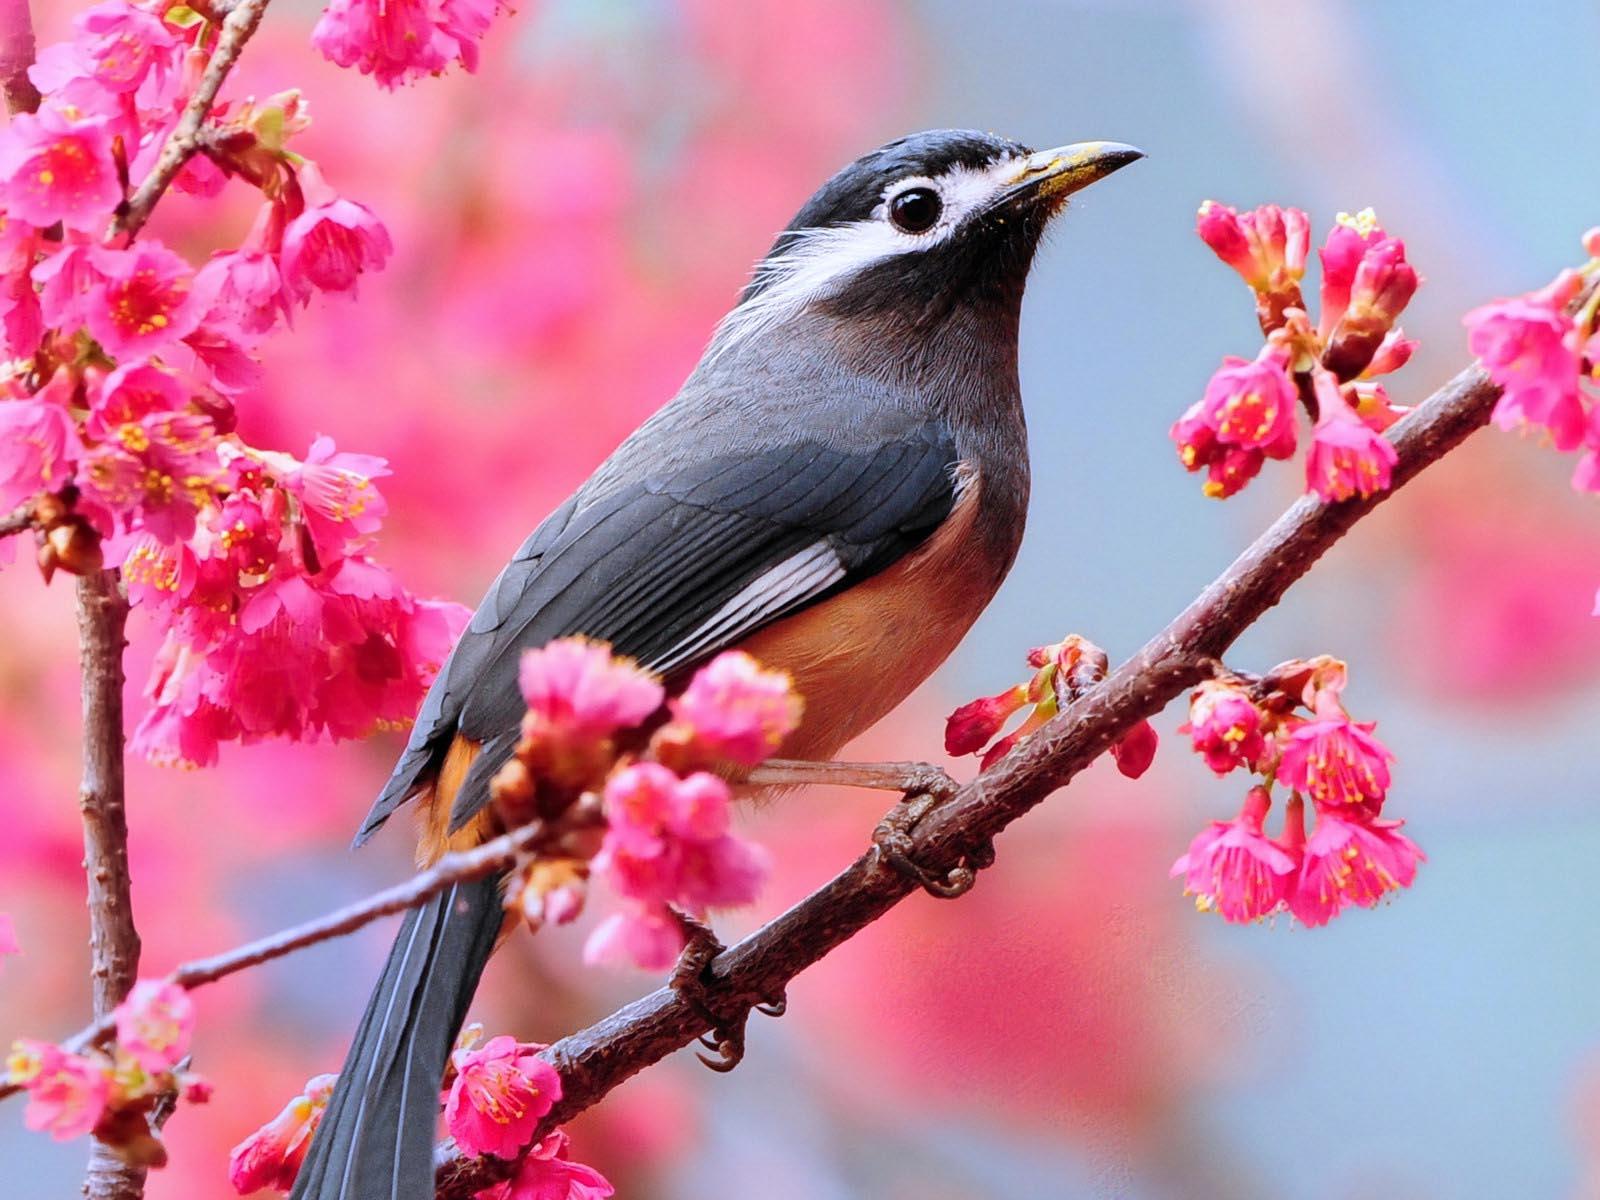 Birds Wallpaper: Love Birds Desktop Wallpapers HD